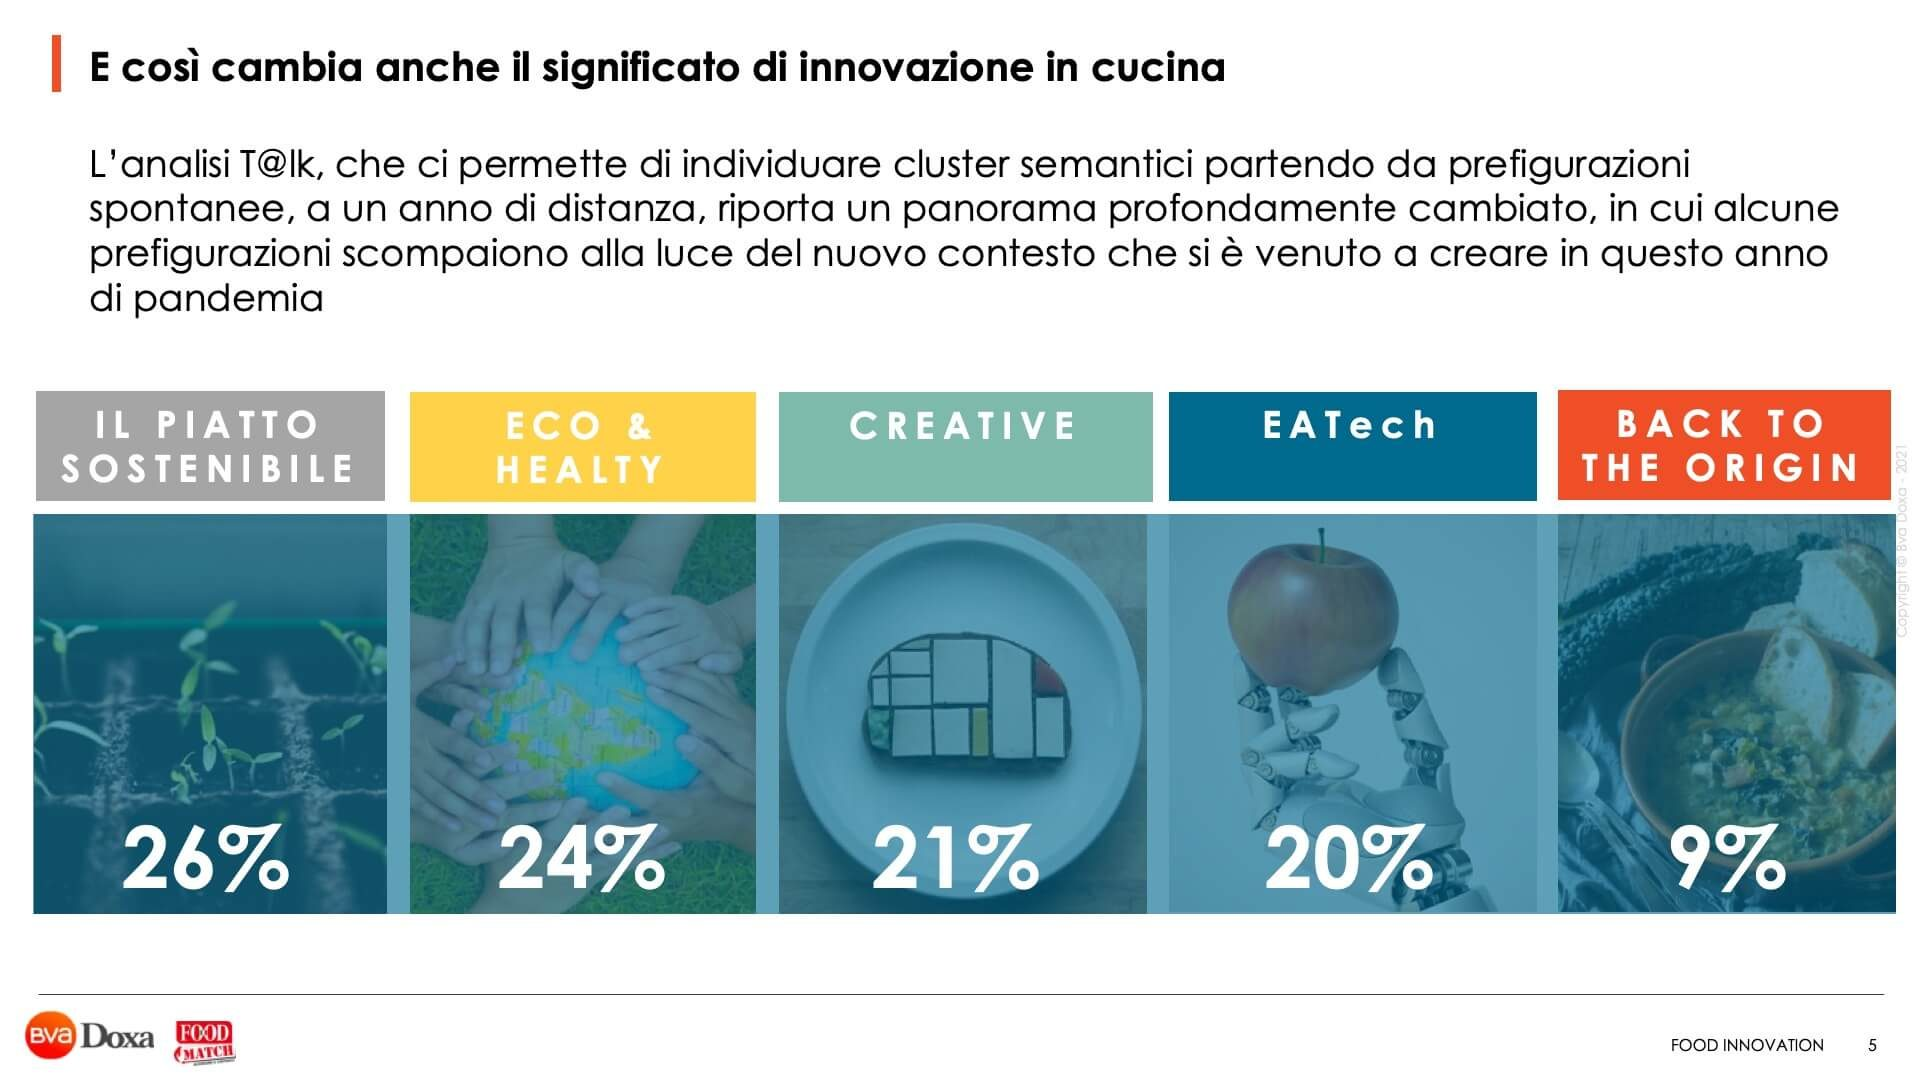 Food Innovation Conti Doxa Bva 04